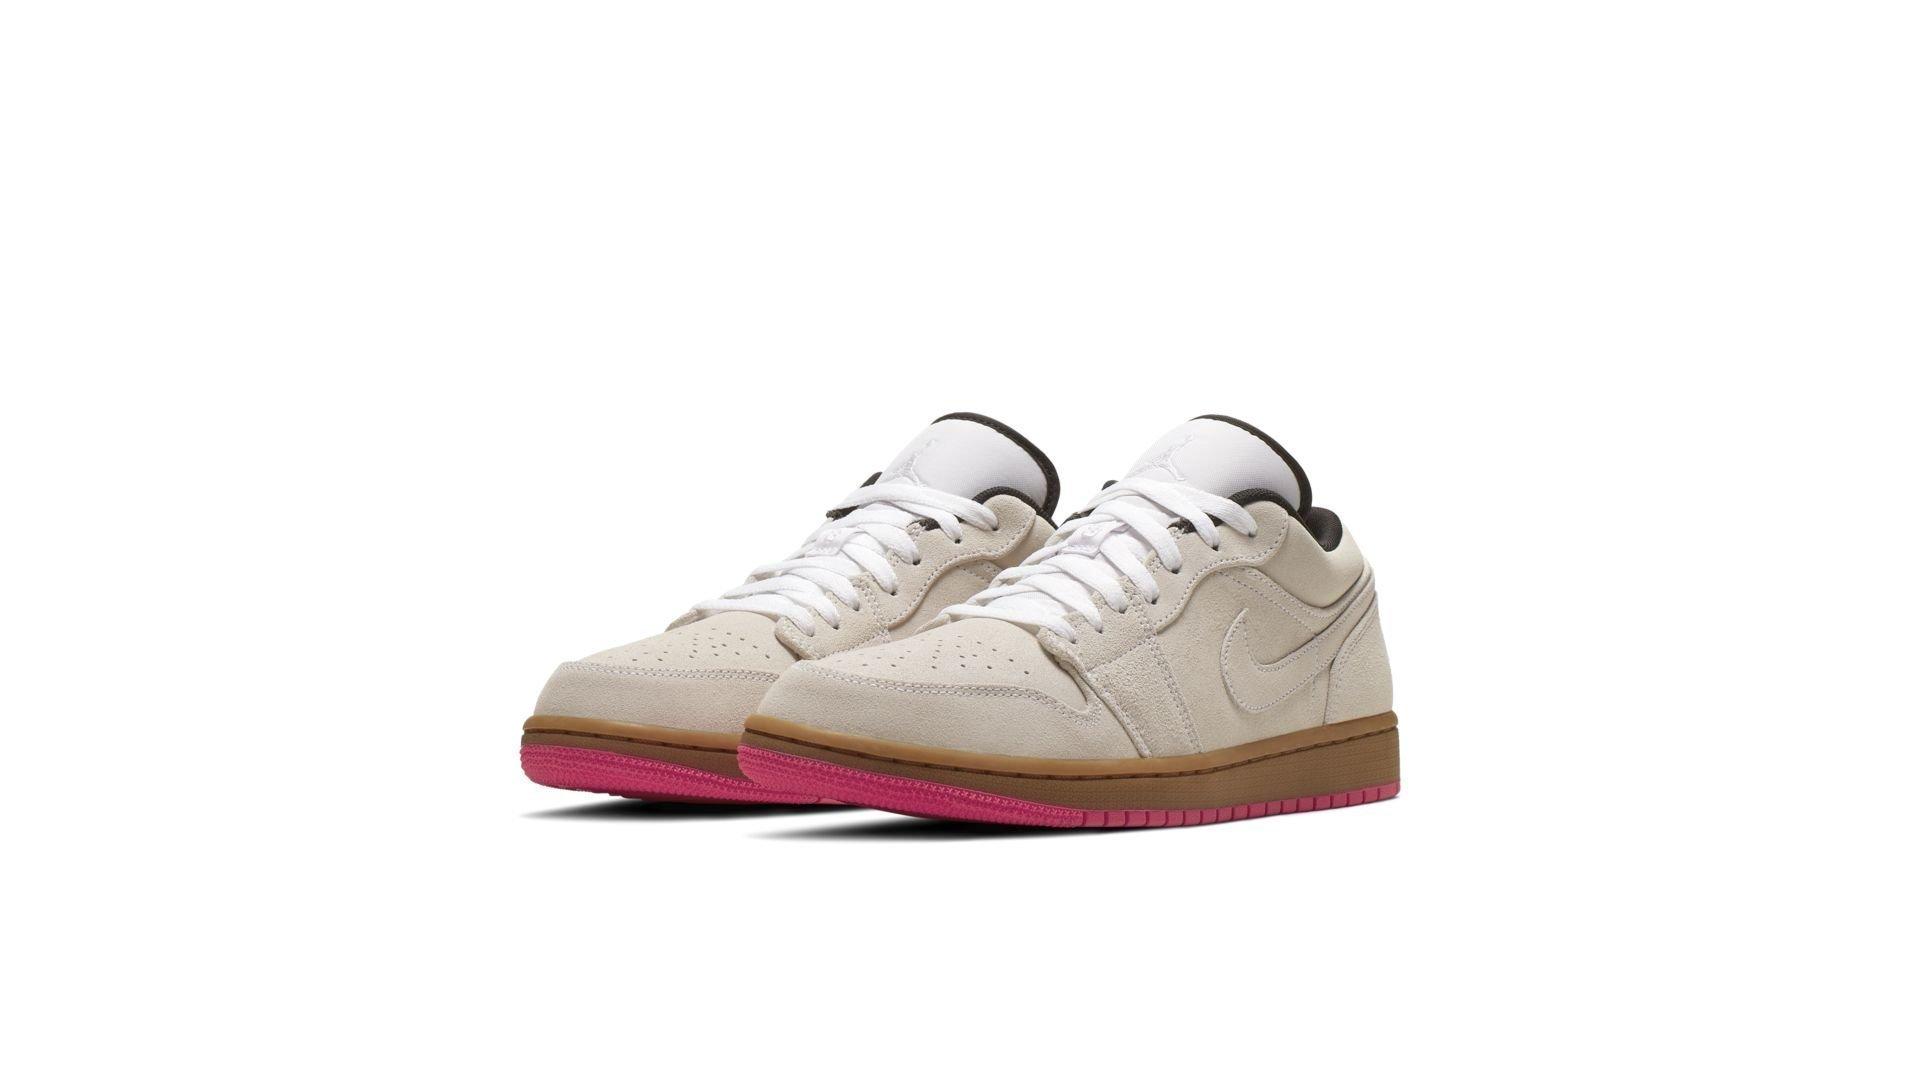 Jordan 1 Low White Gum Hyper Pink (553558-119)